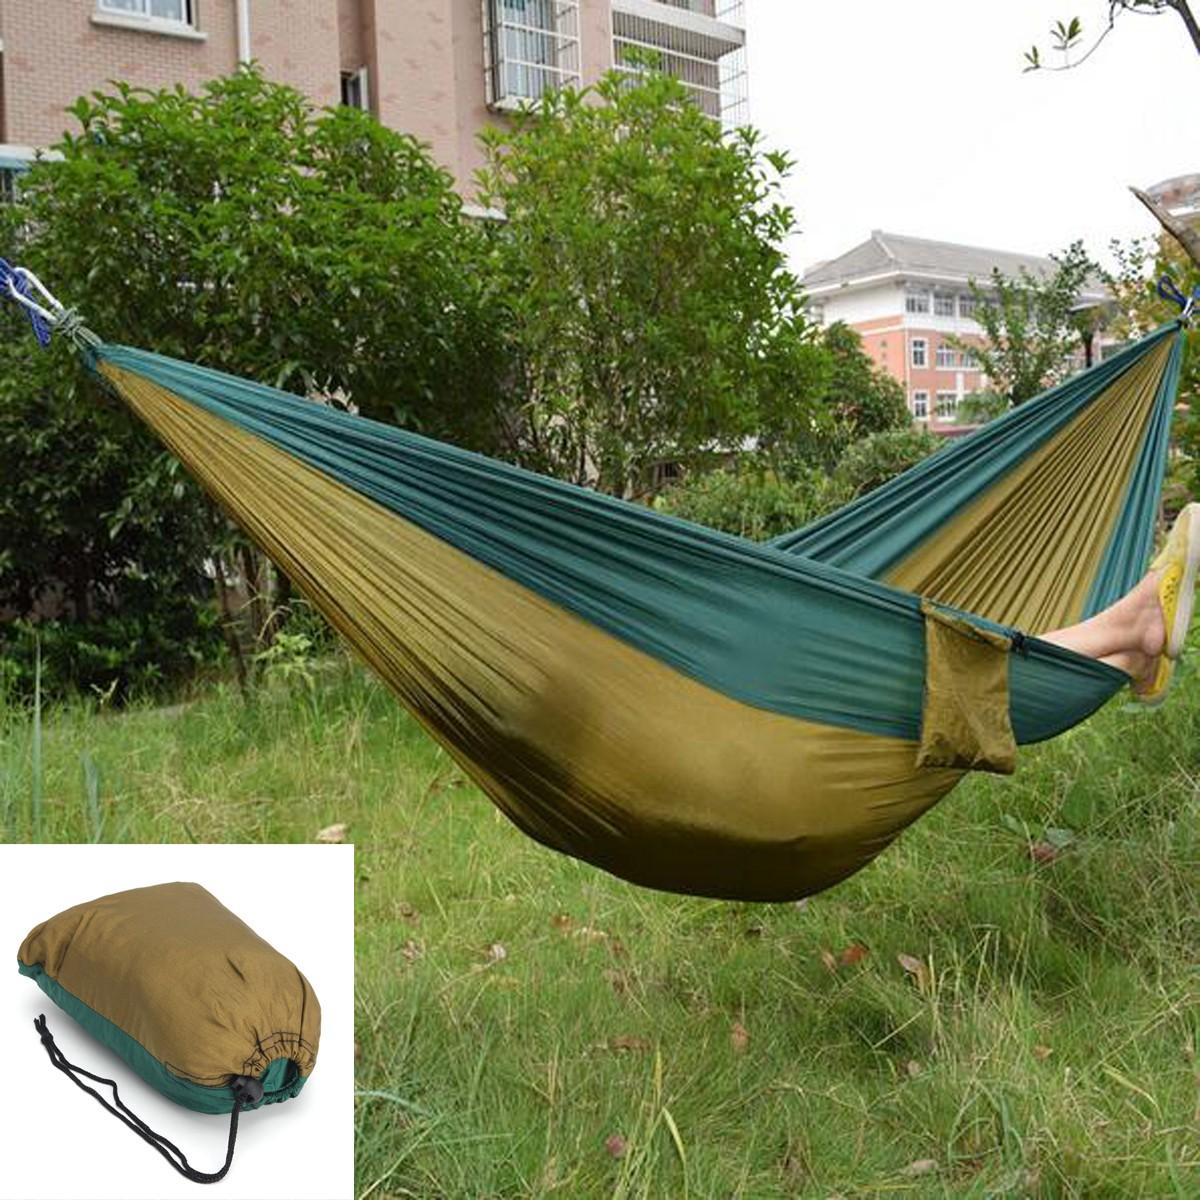 Outdoor Garden Portable Hammock Two Person Double Swing